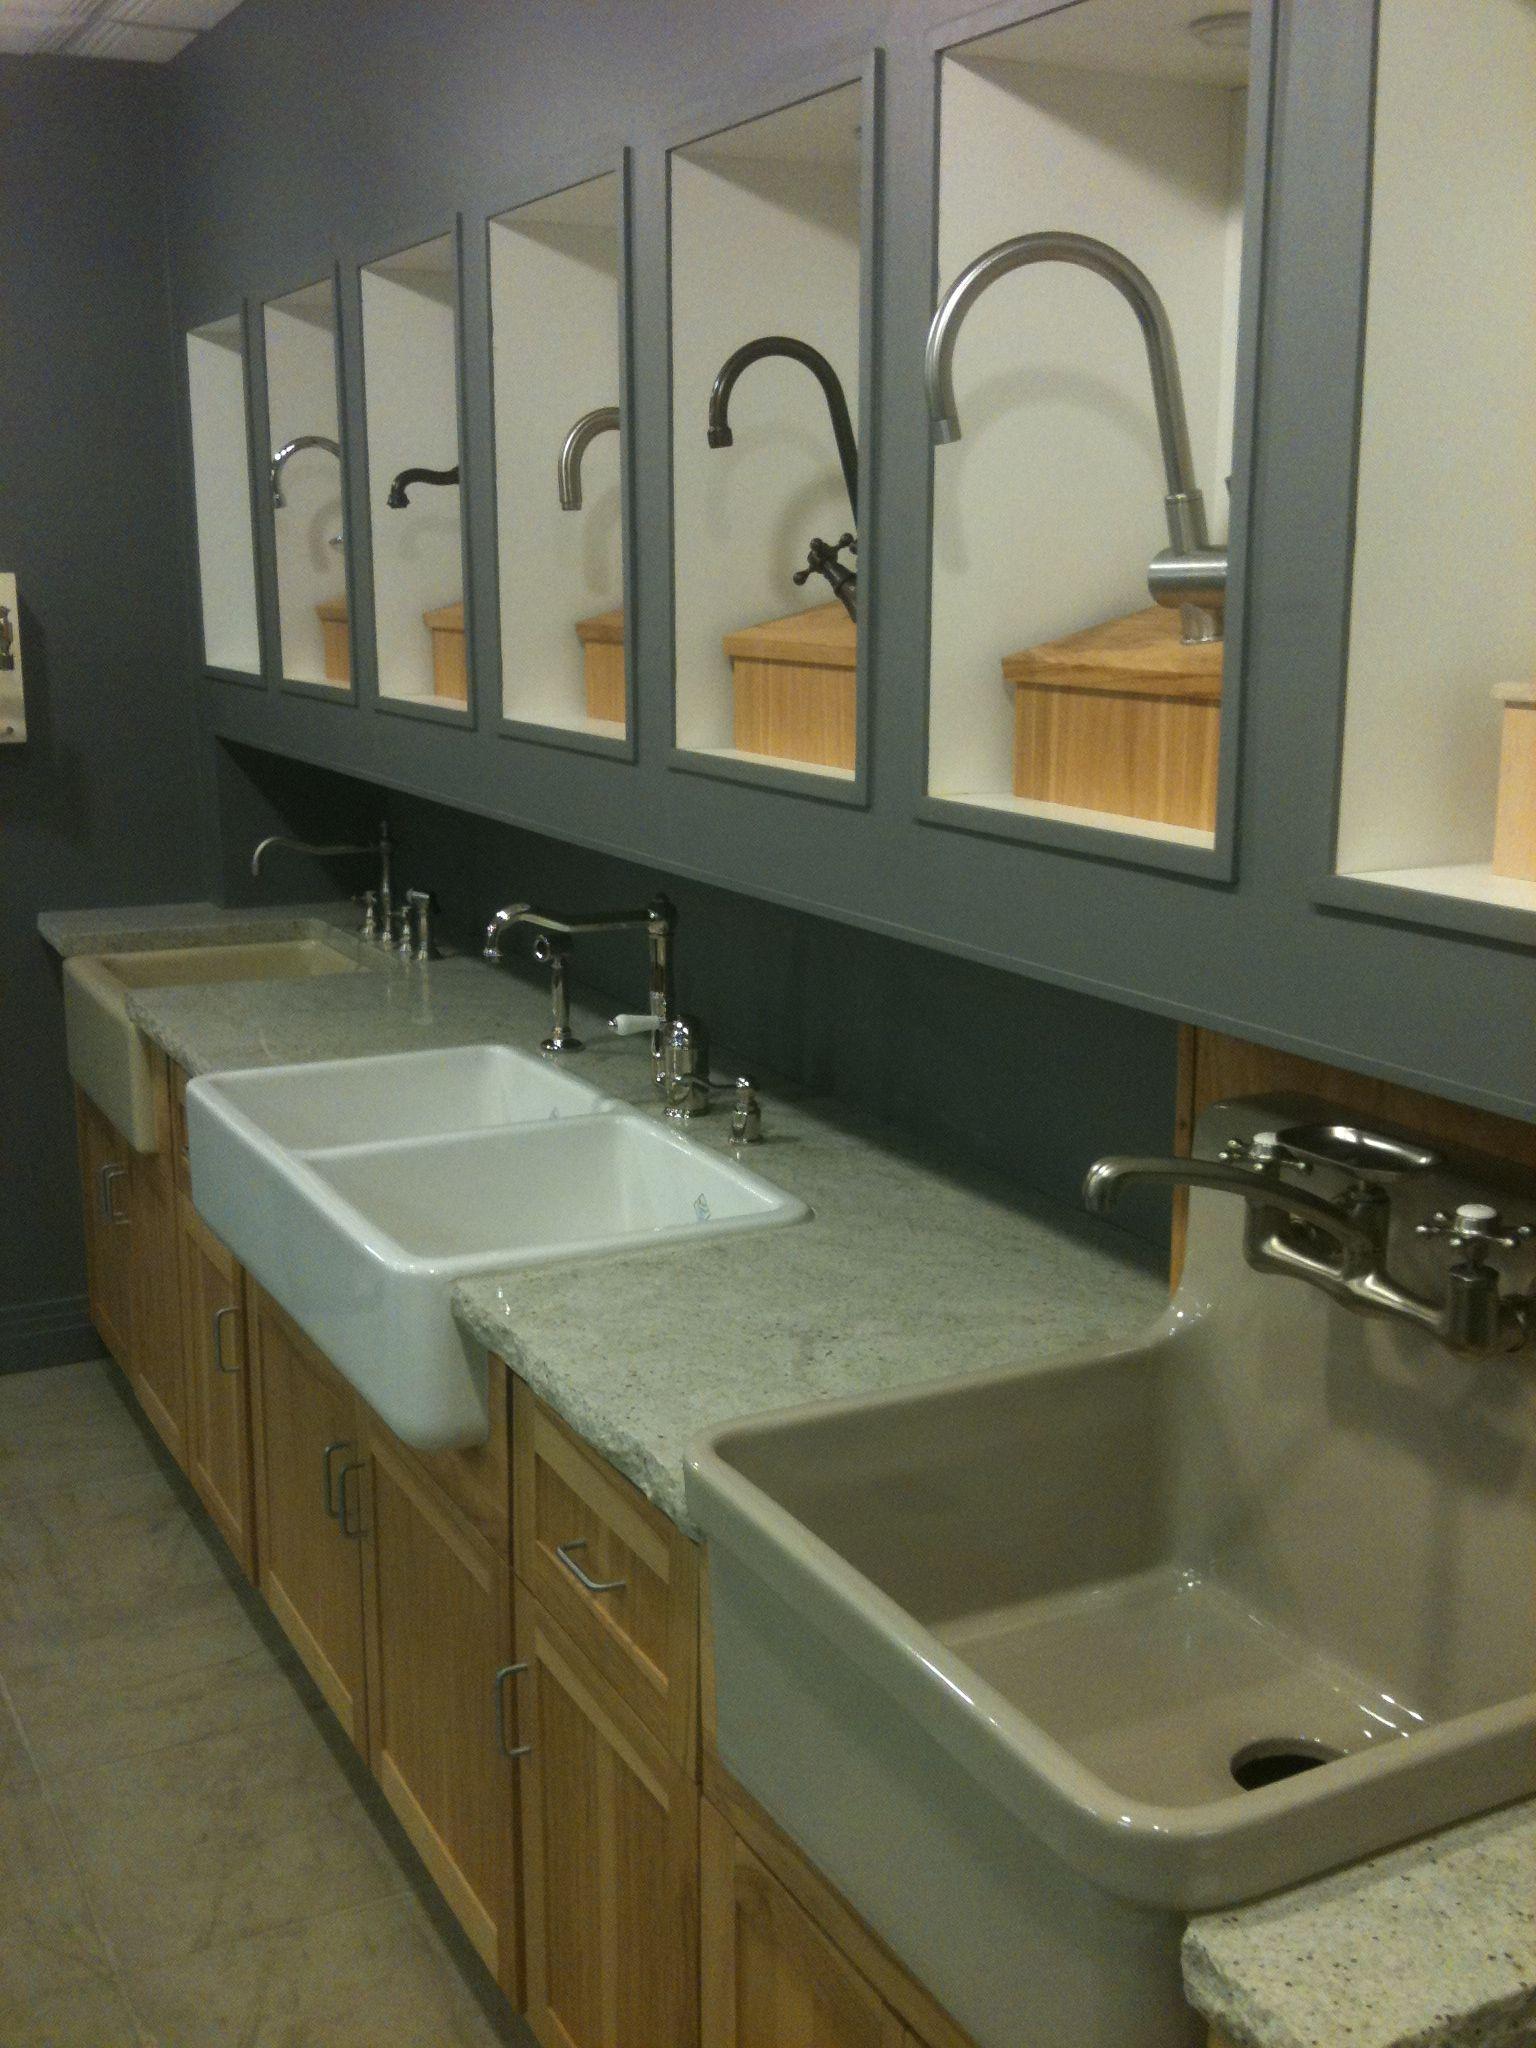 Kitchen Sinks Denver : Kitchen Sinks and Faucets Galore Our Denver Showroom Pinterest